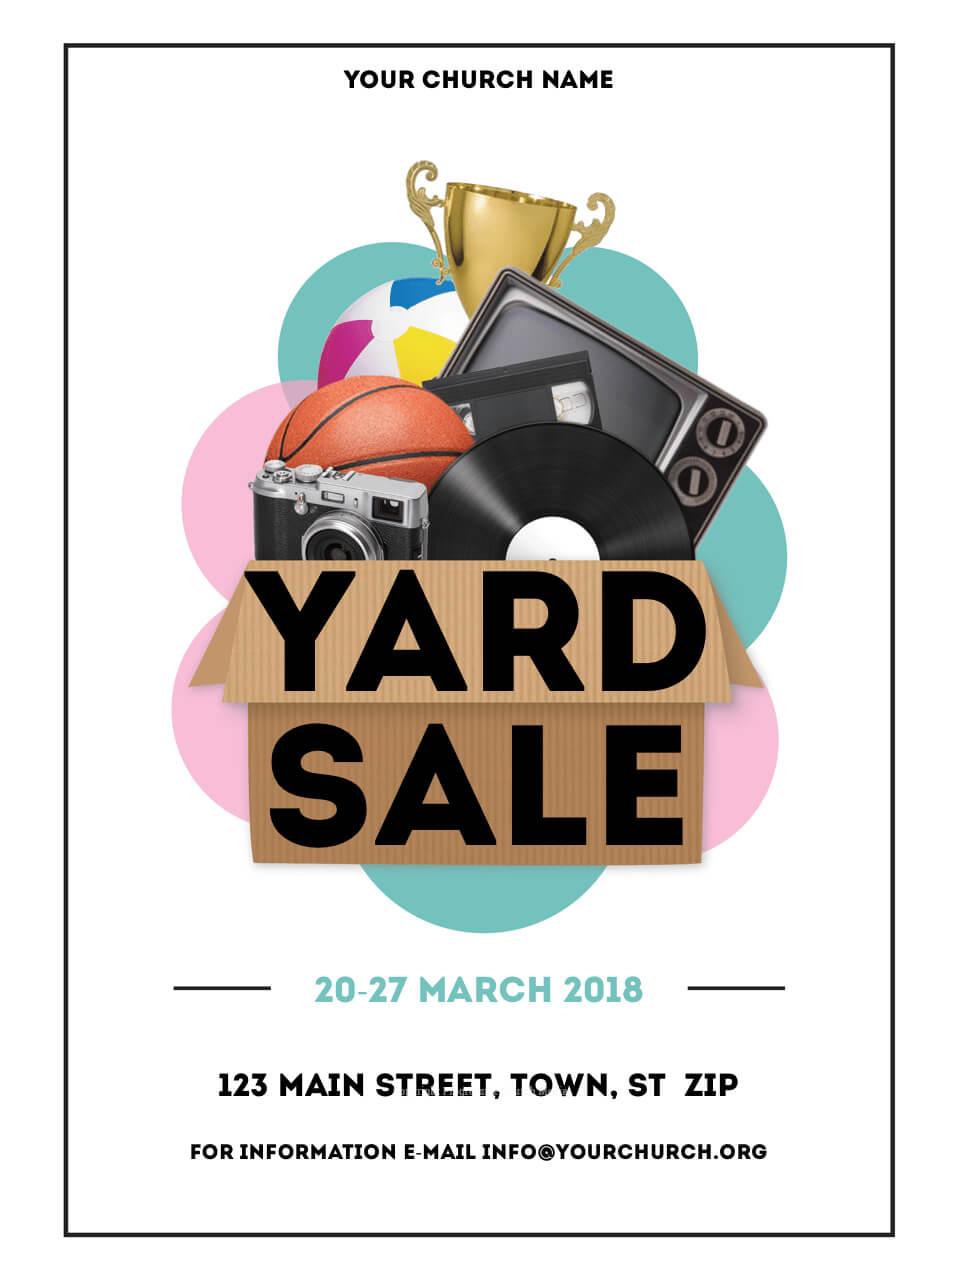 032 Yard2 1Fit9602C1280Ssl1 Yard Sale Flyer Template Throughout Yard Sale Flyer Template Word